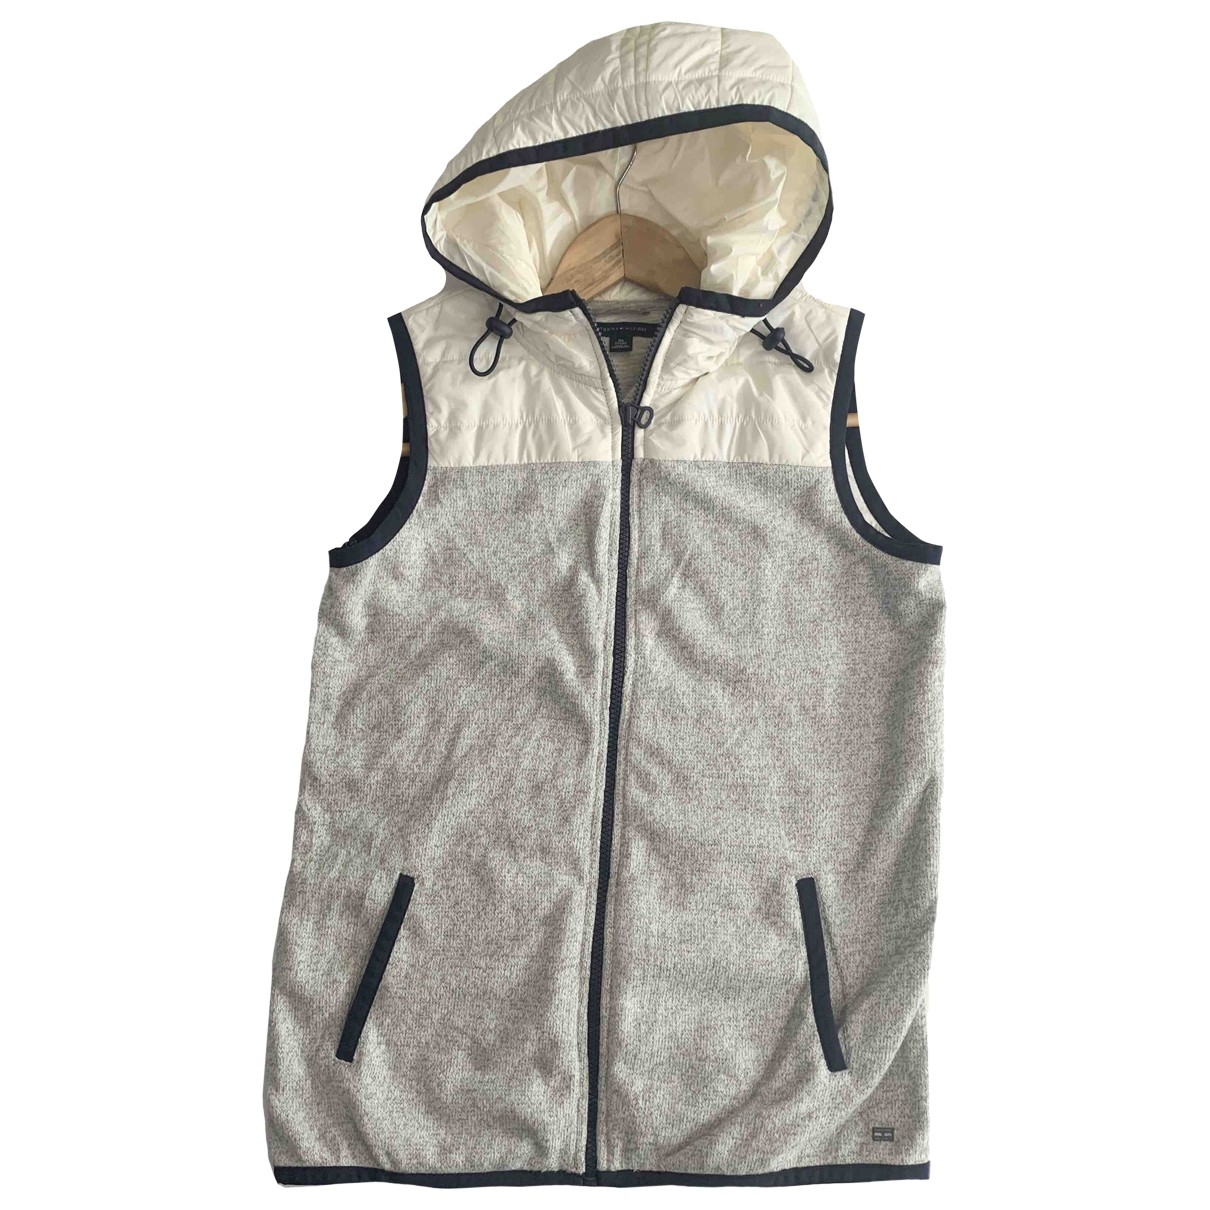 Tommy Hilfiger \N Leather jacket for Women XS International